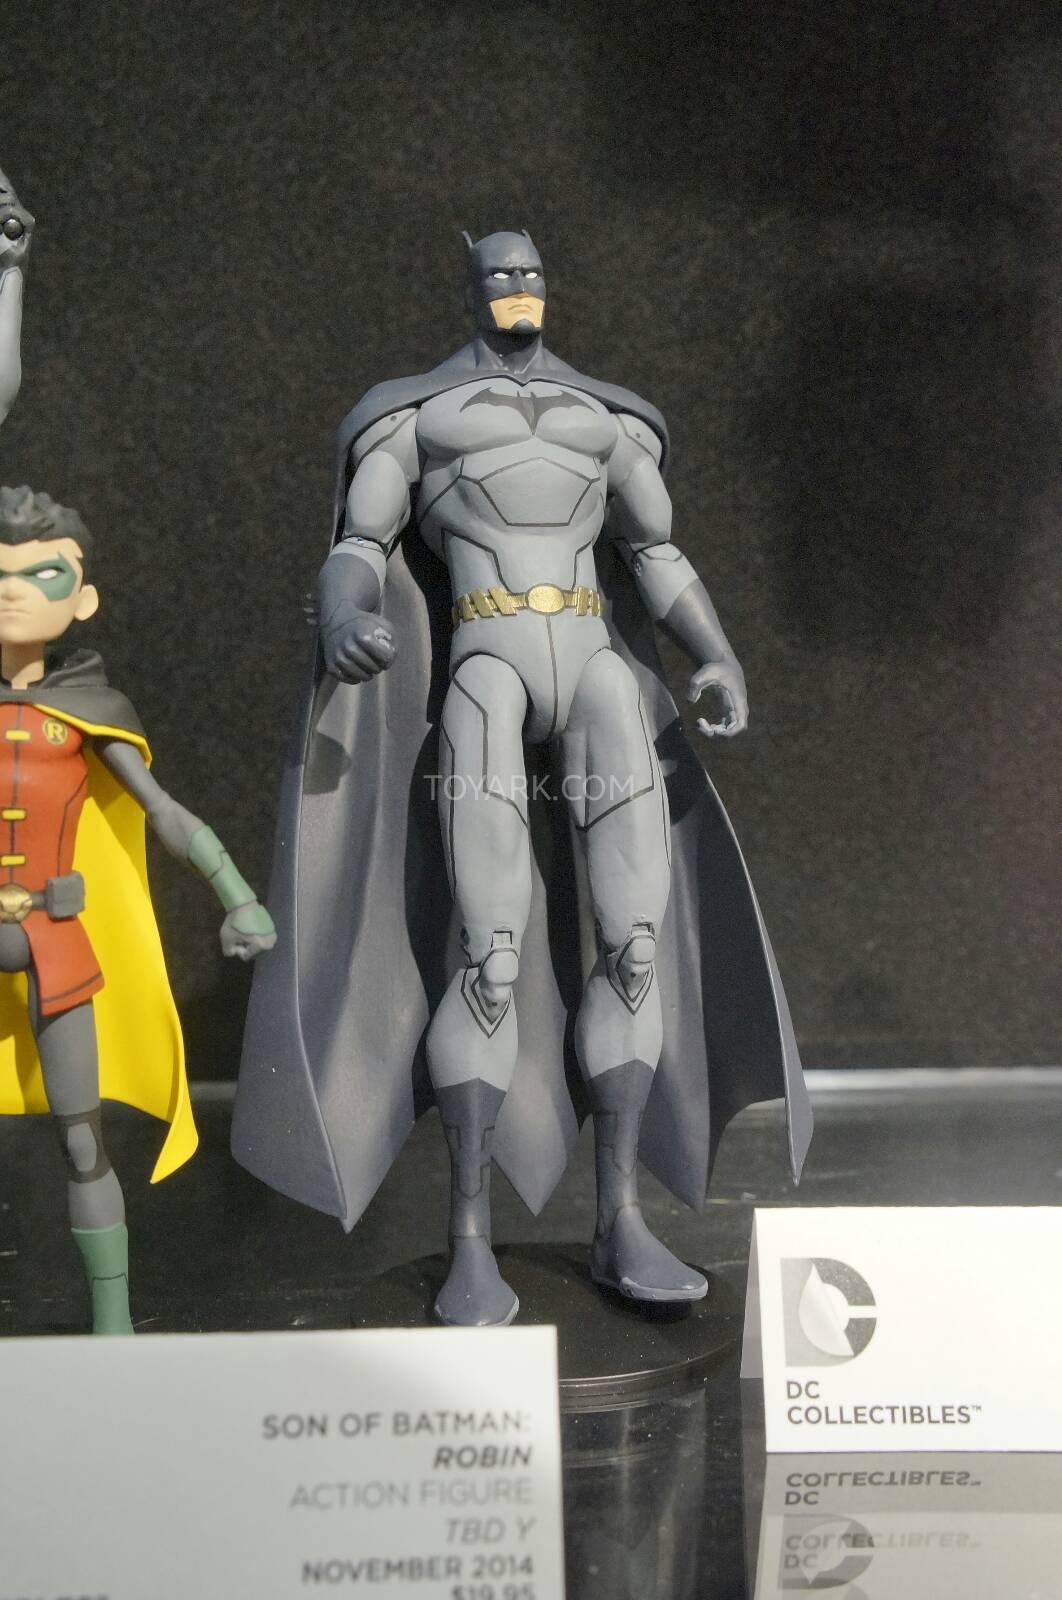 [Toy Fair 2014] DC Collectibles Toy-Fair-2014-DC-Collectibles-107